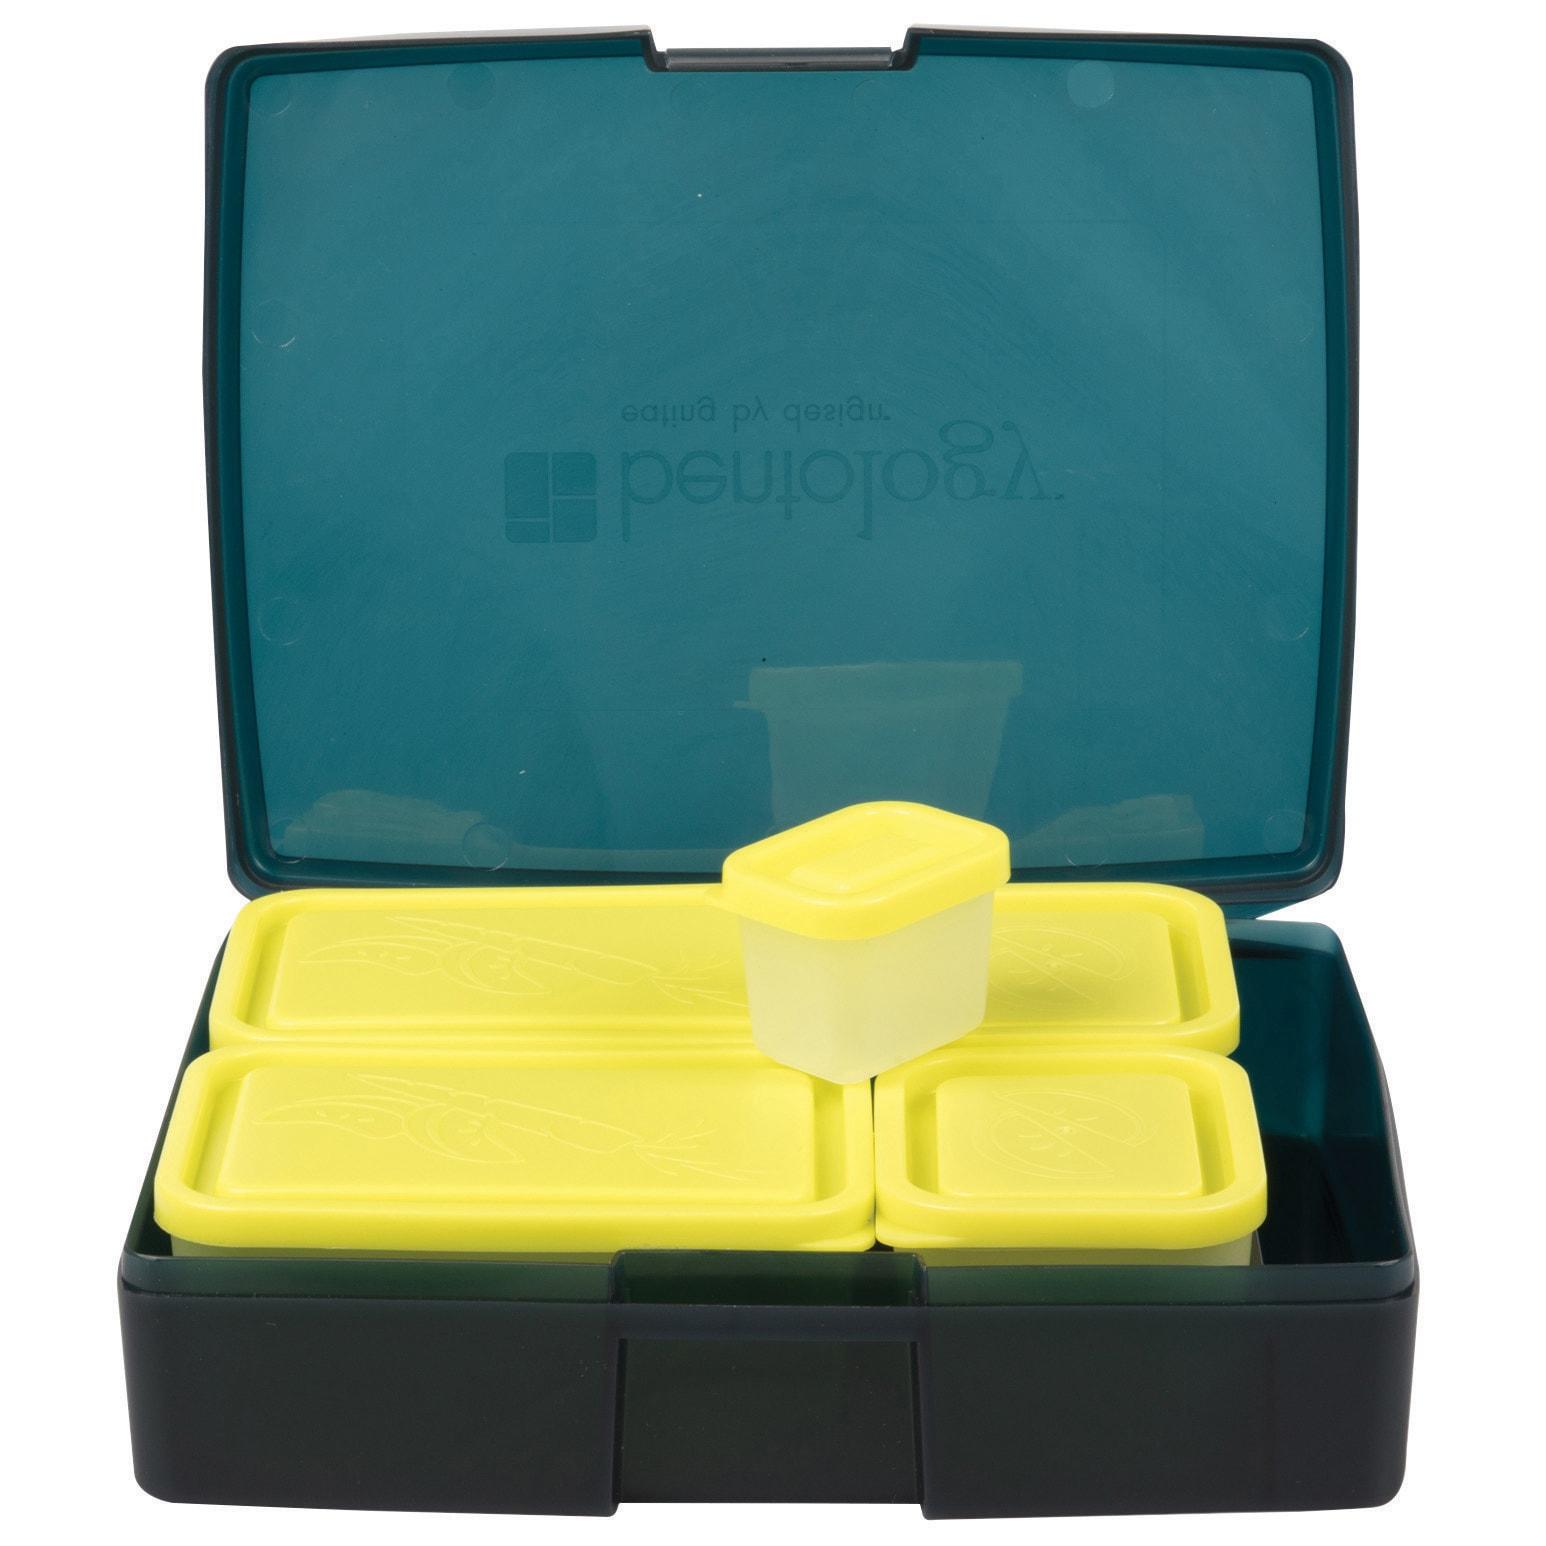 Bentology Classic 6-Piece Bento Box Set, Assorted Colors